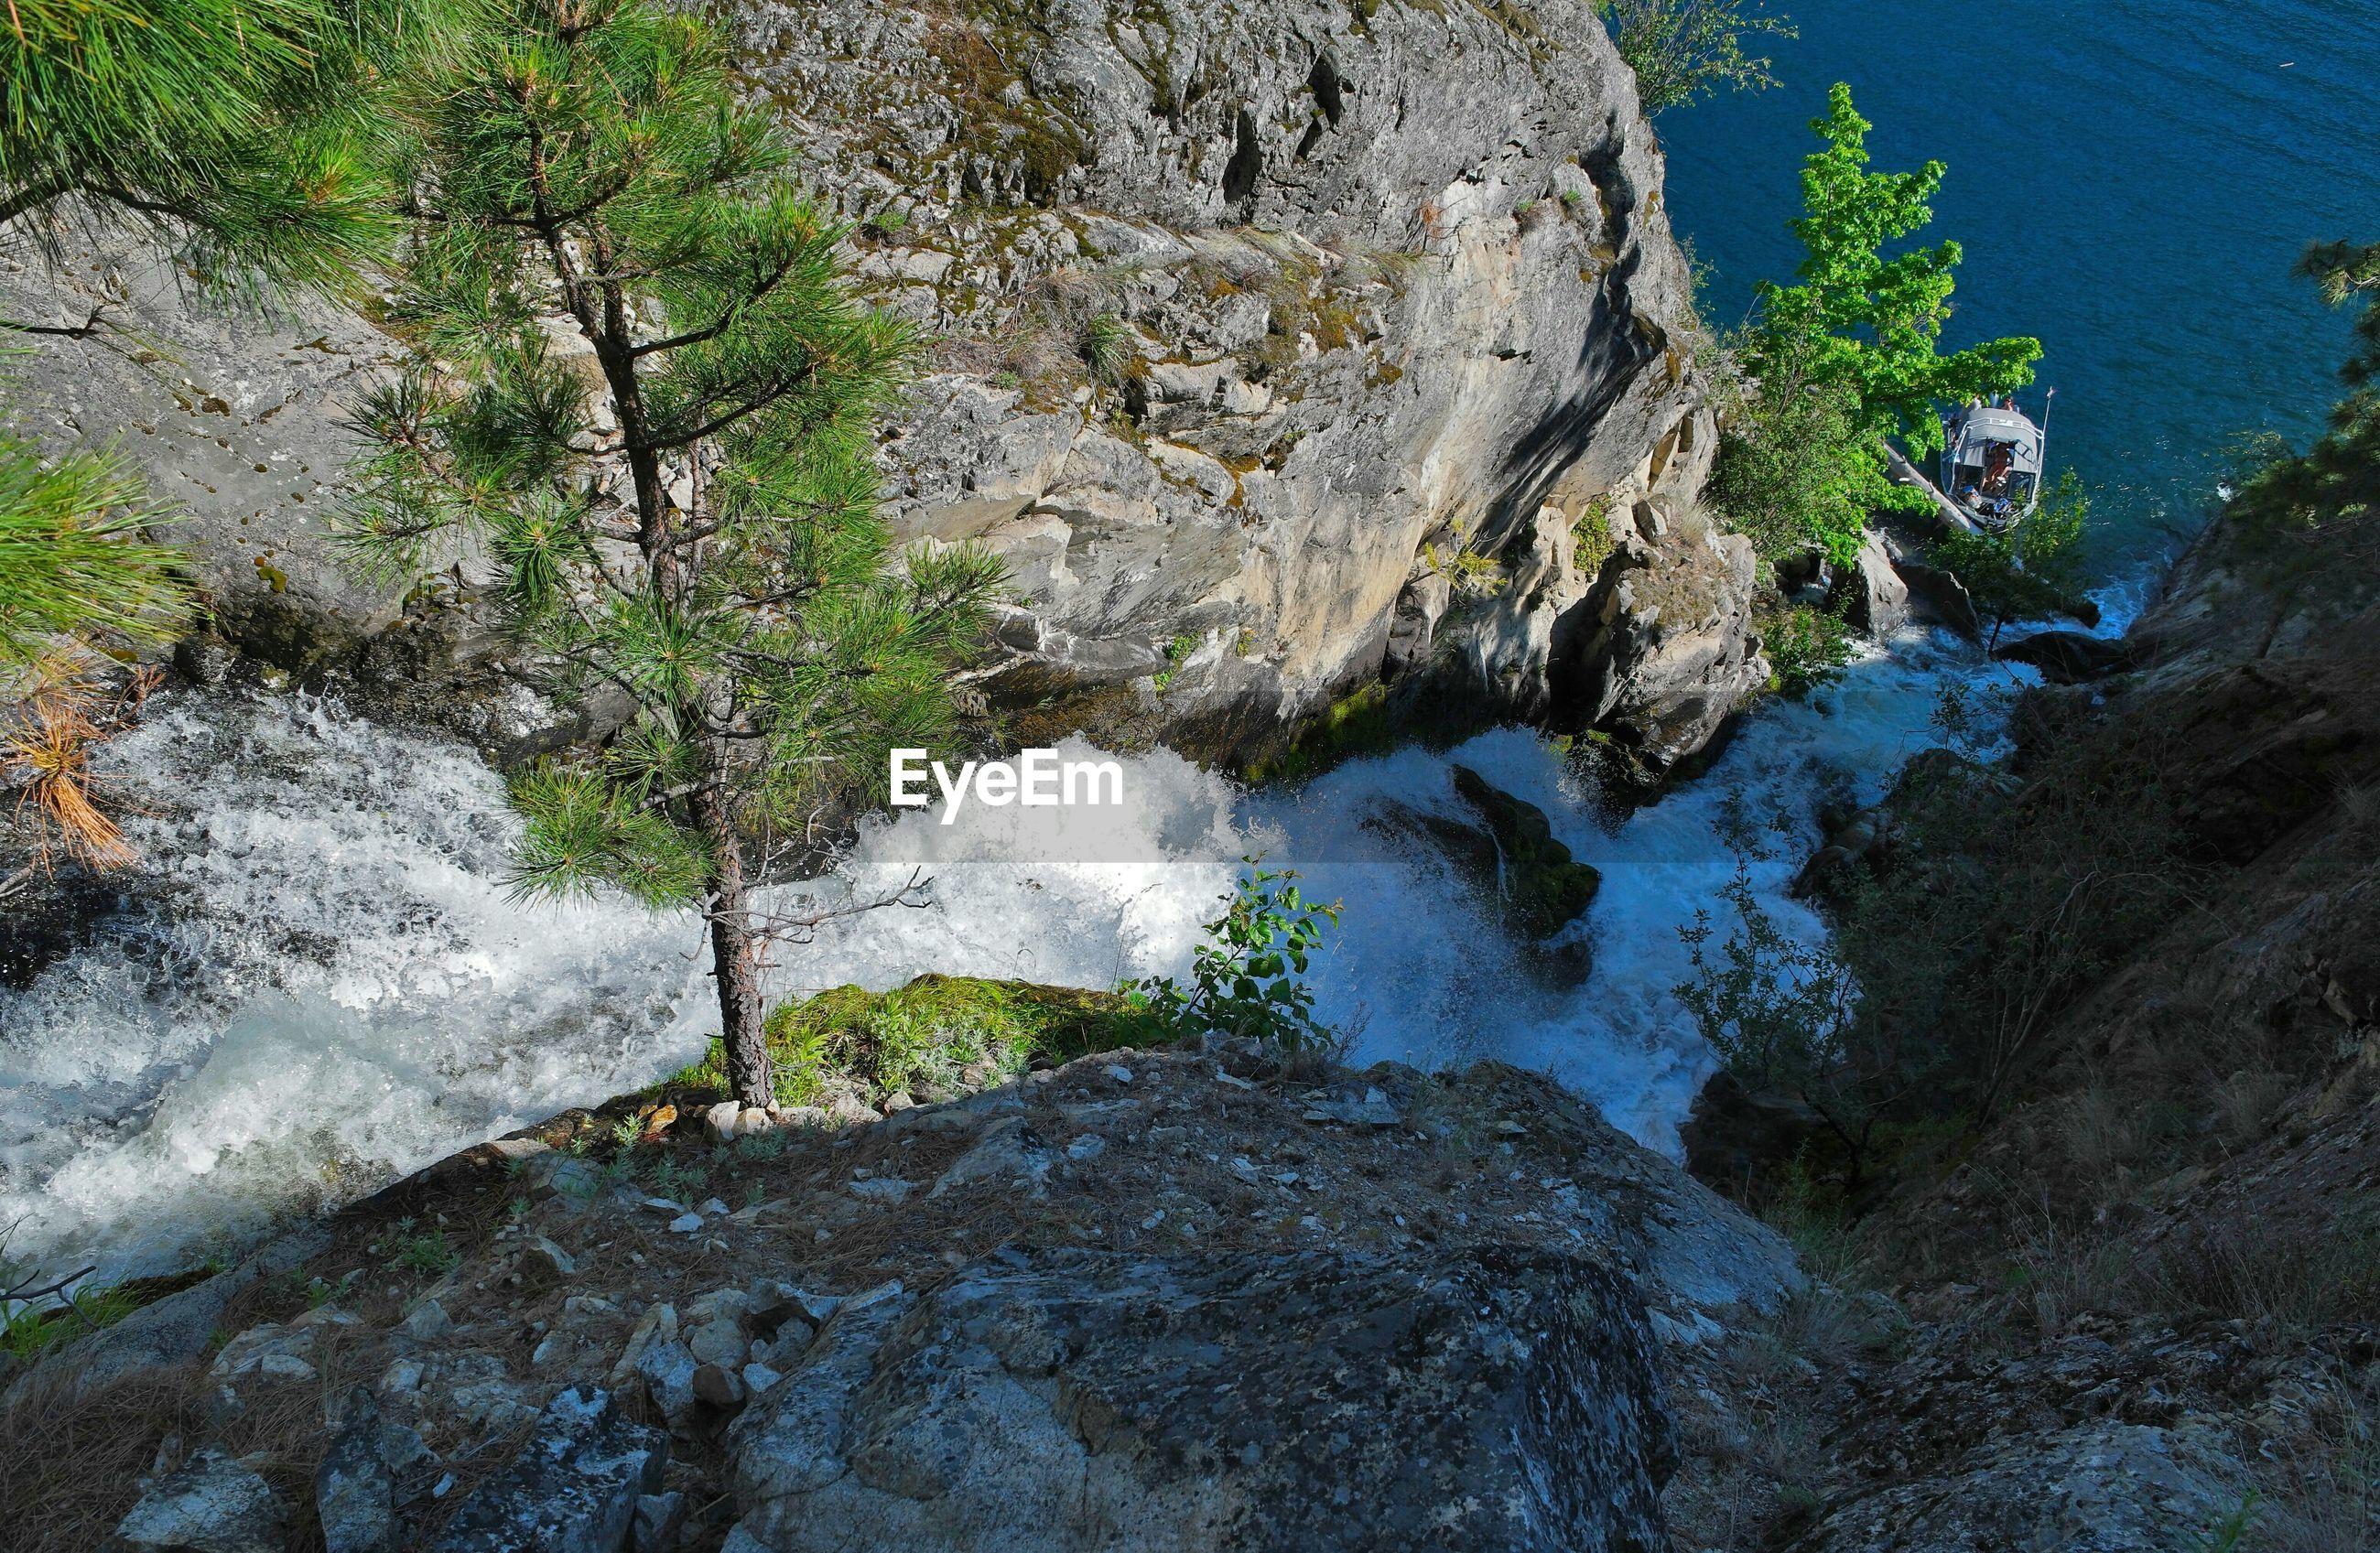 Waterfall emptying into lake chelan